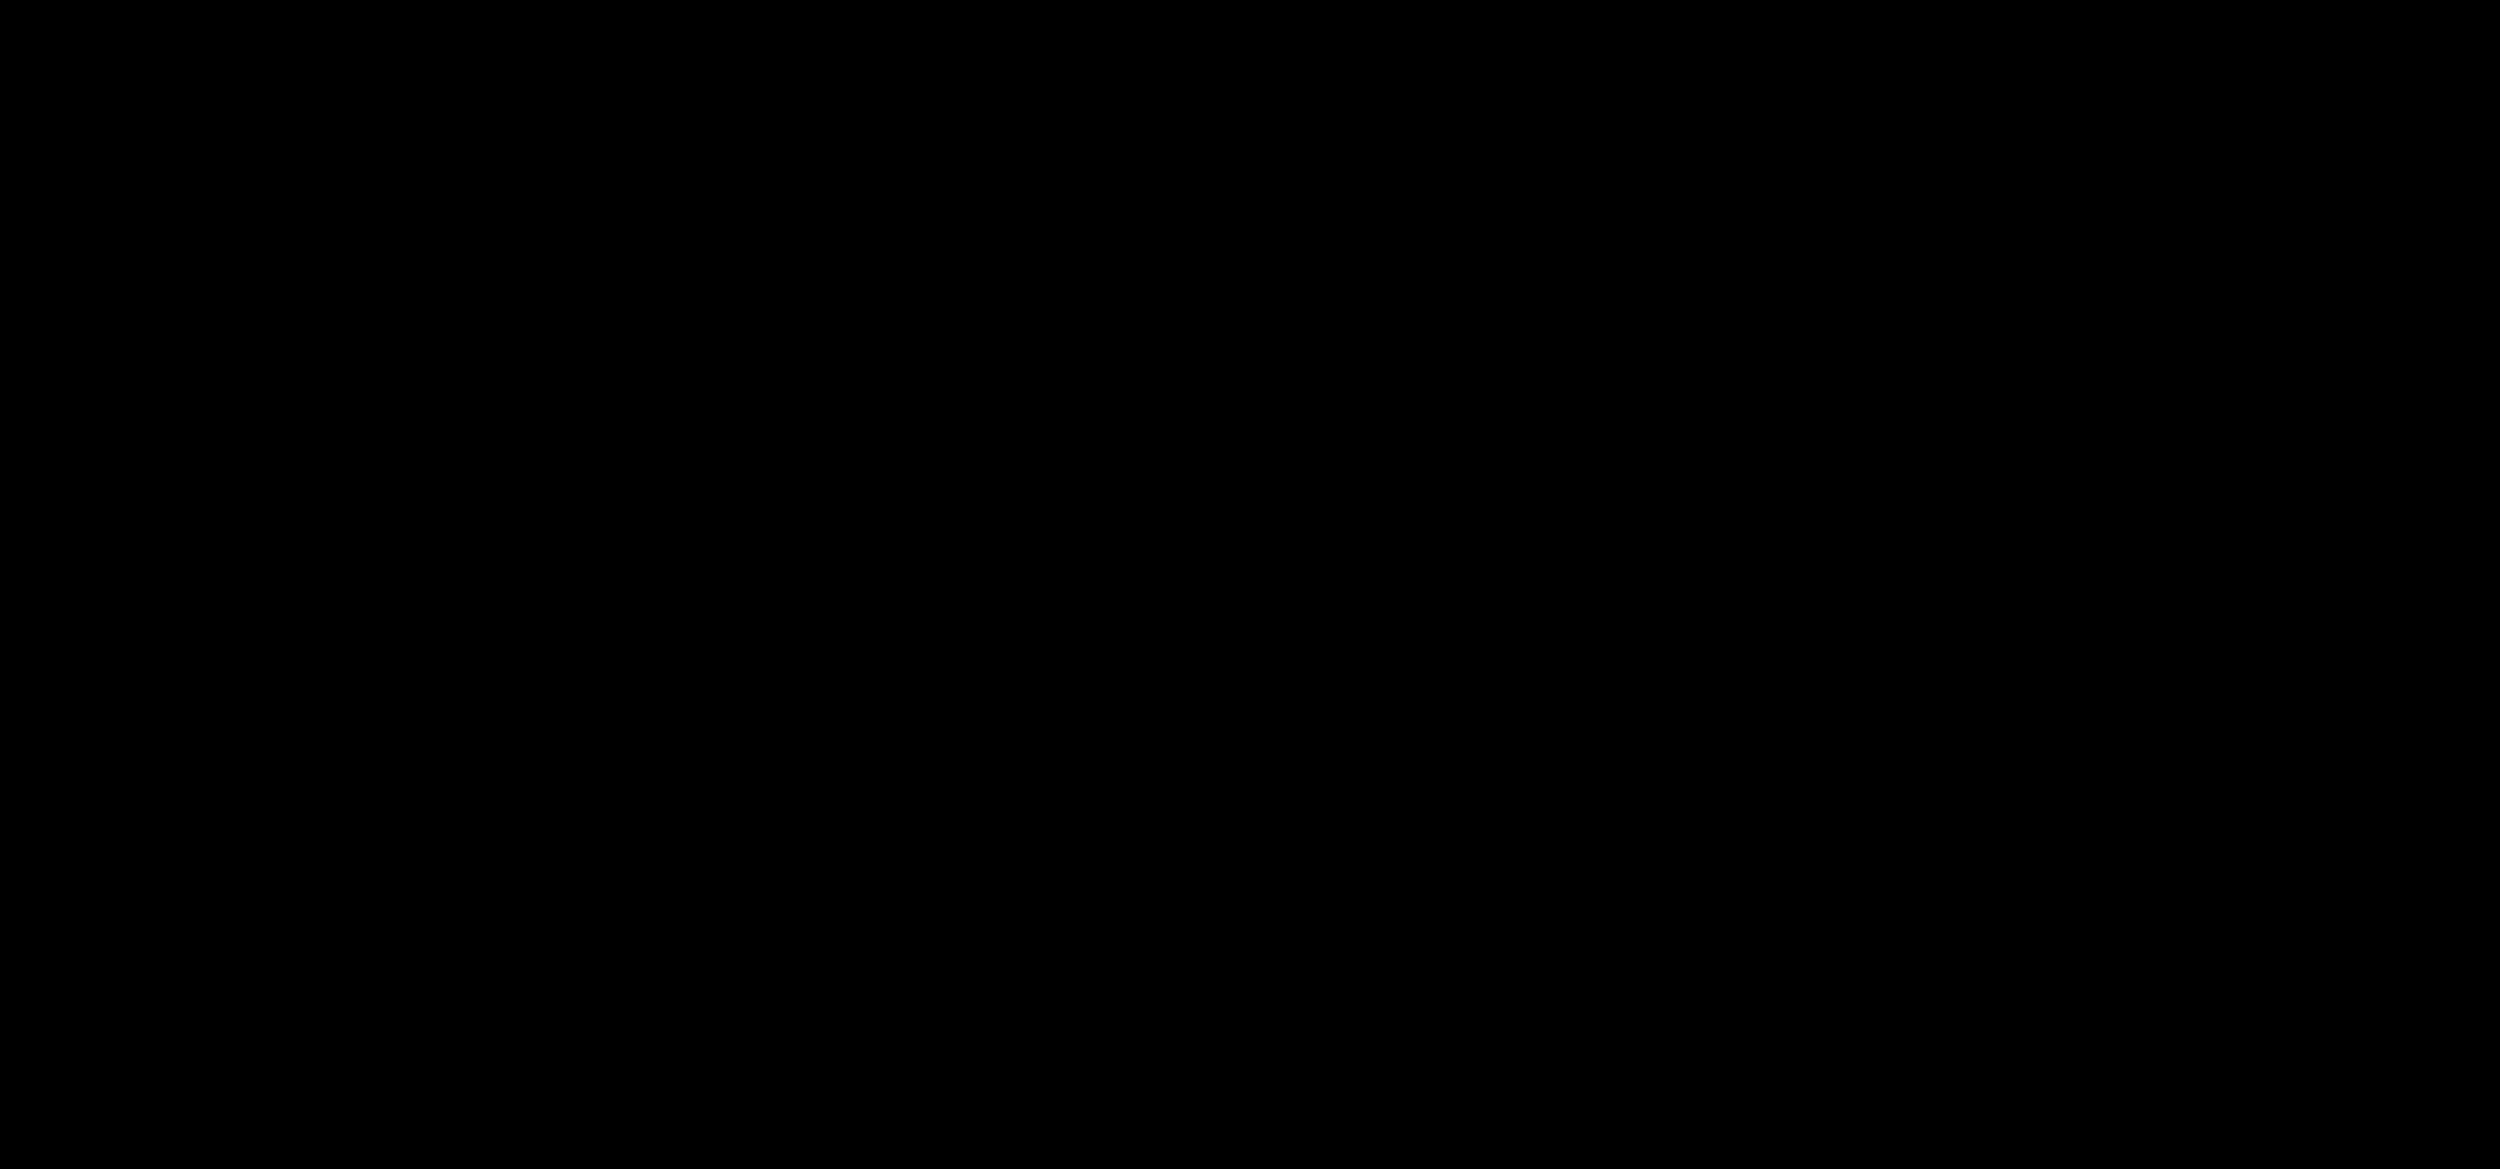 logo-black (6).png